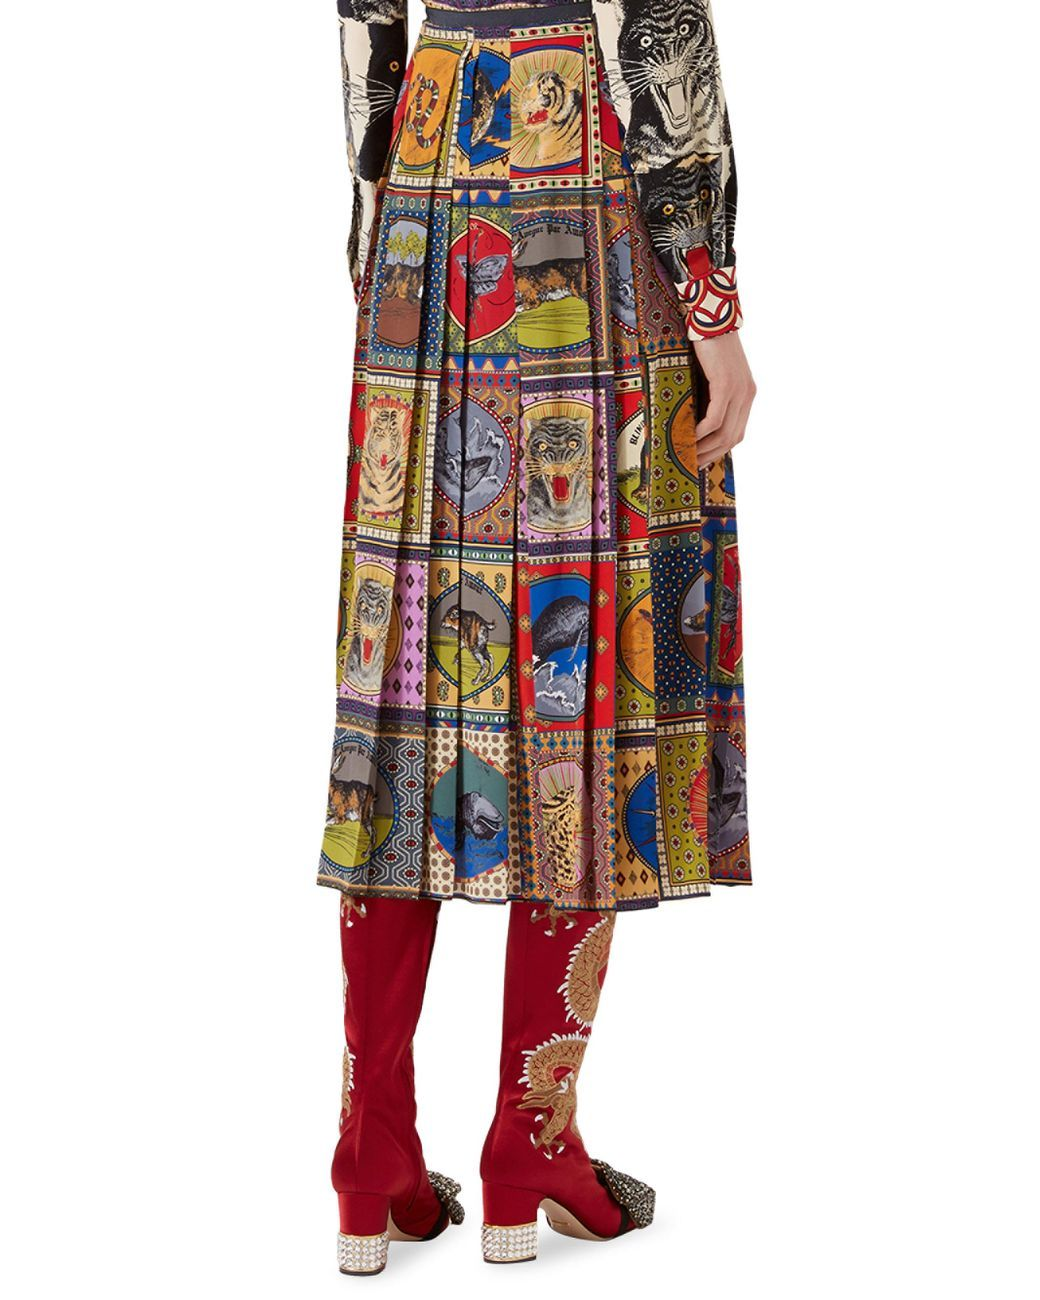 afa1a5a2311 Women's Pleated Tarot Card Skirt | Style | Printed skirts, Silk ...